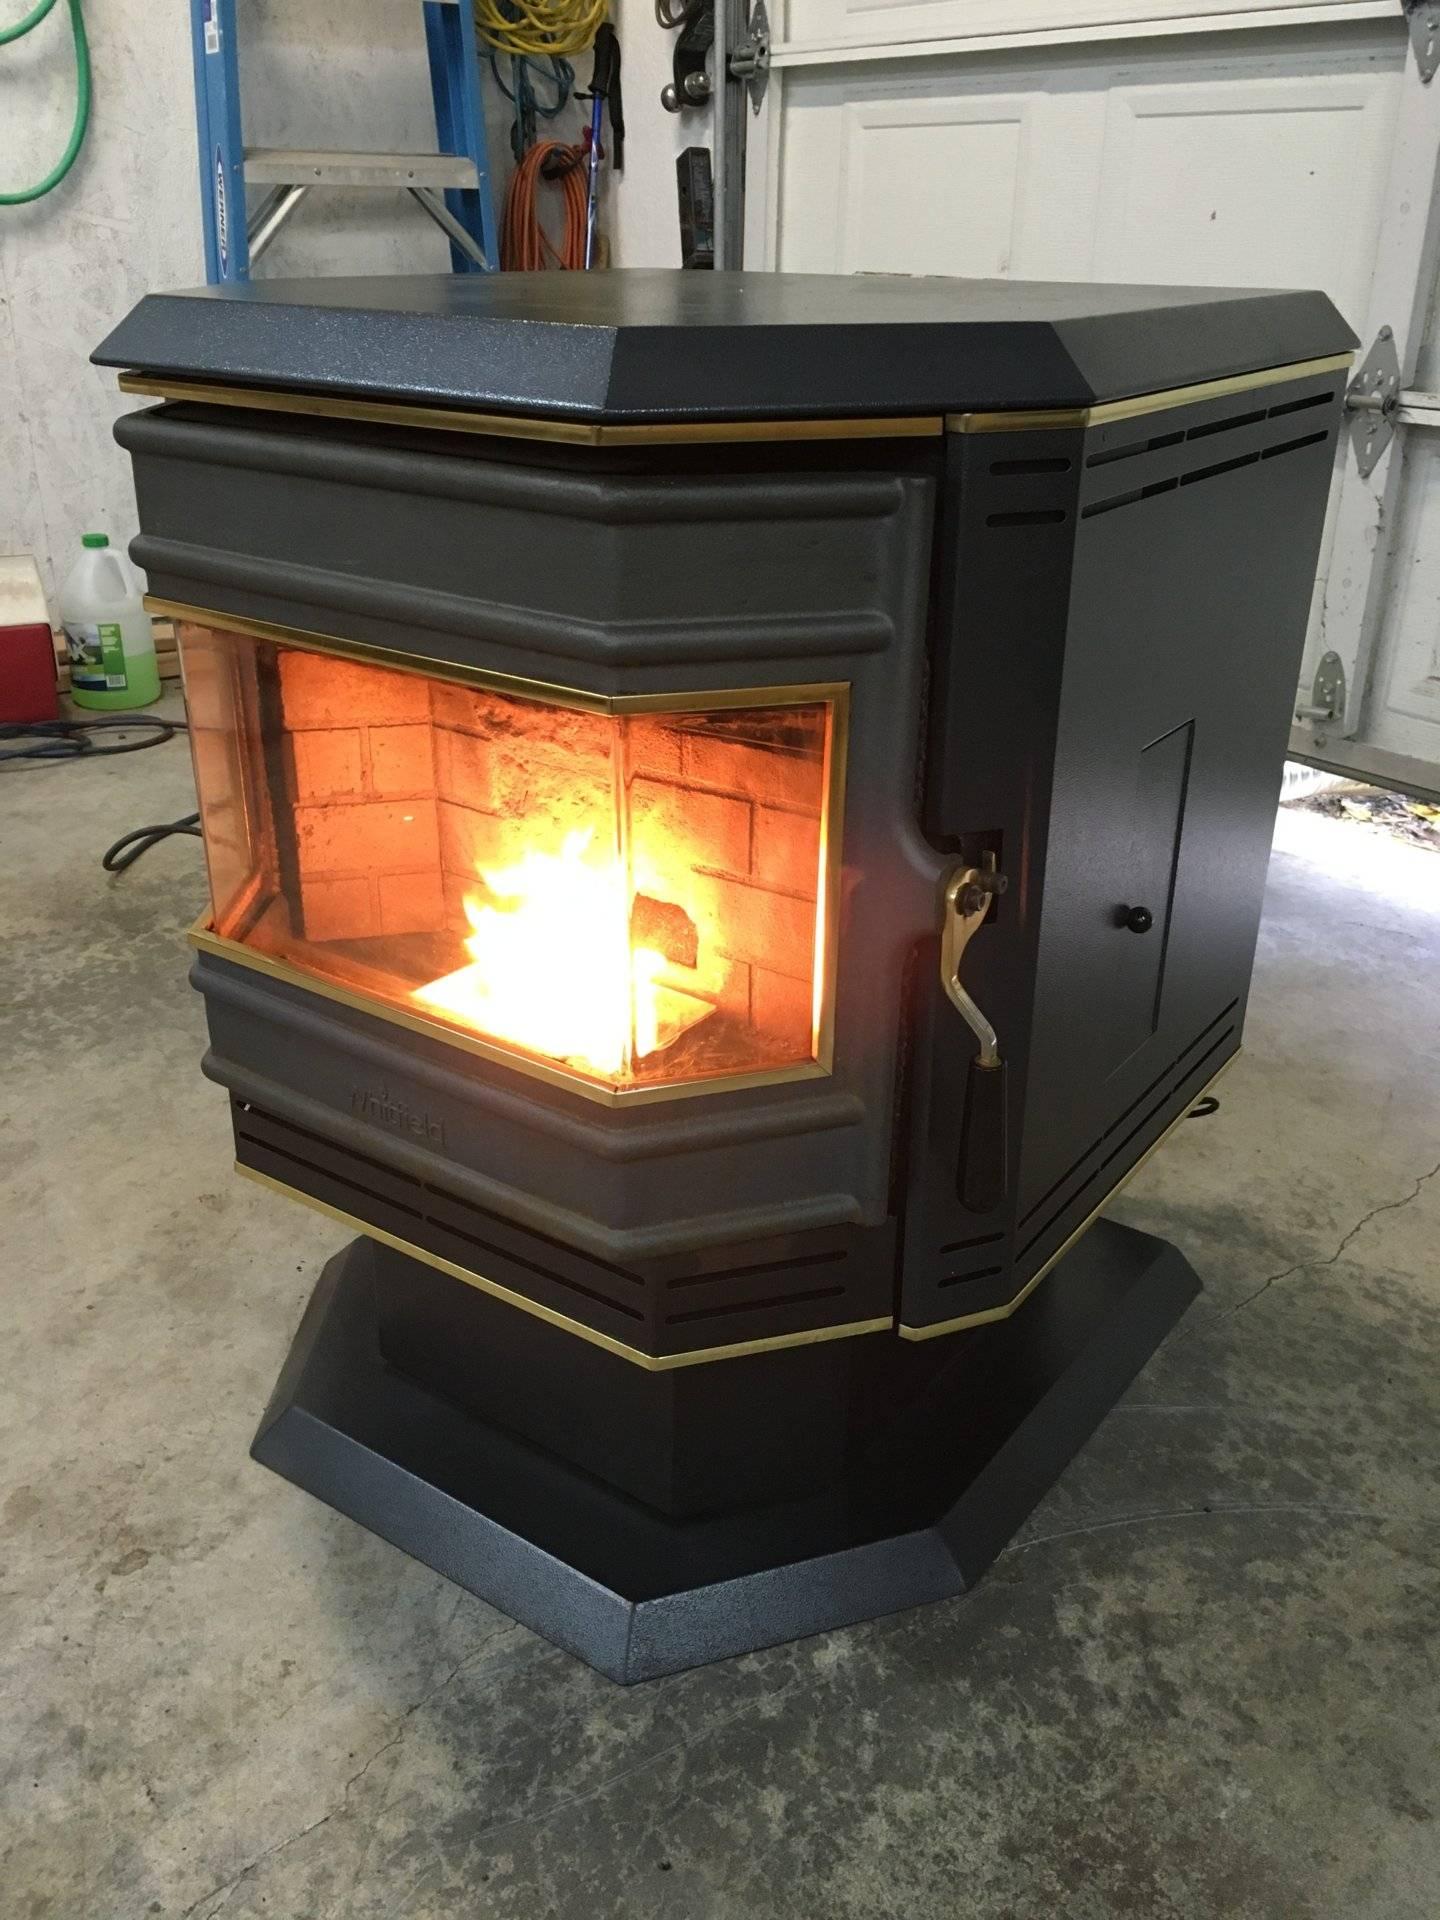 Whitfield advantage plus pellet stove   Bloodydecks